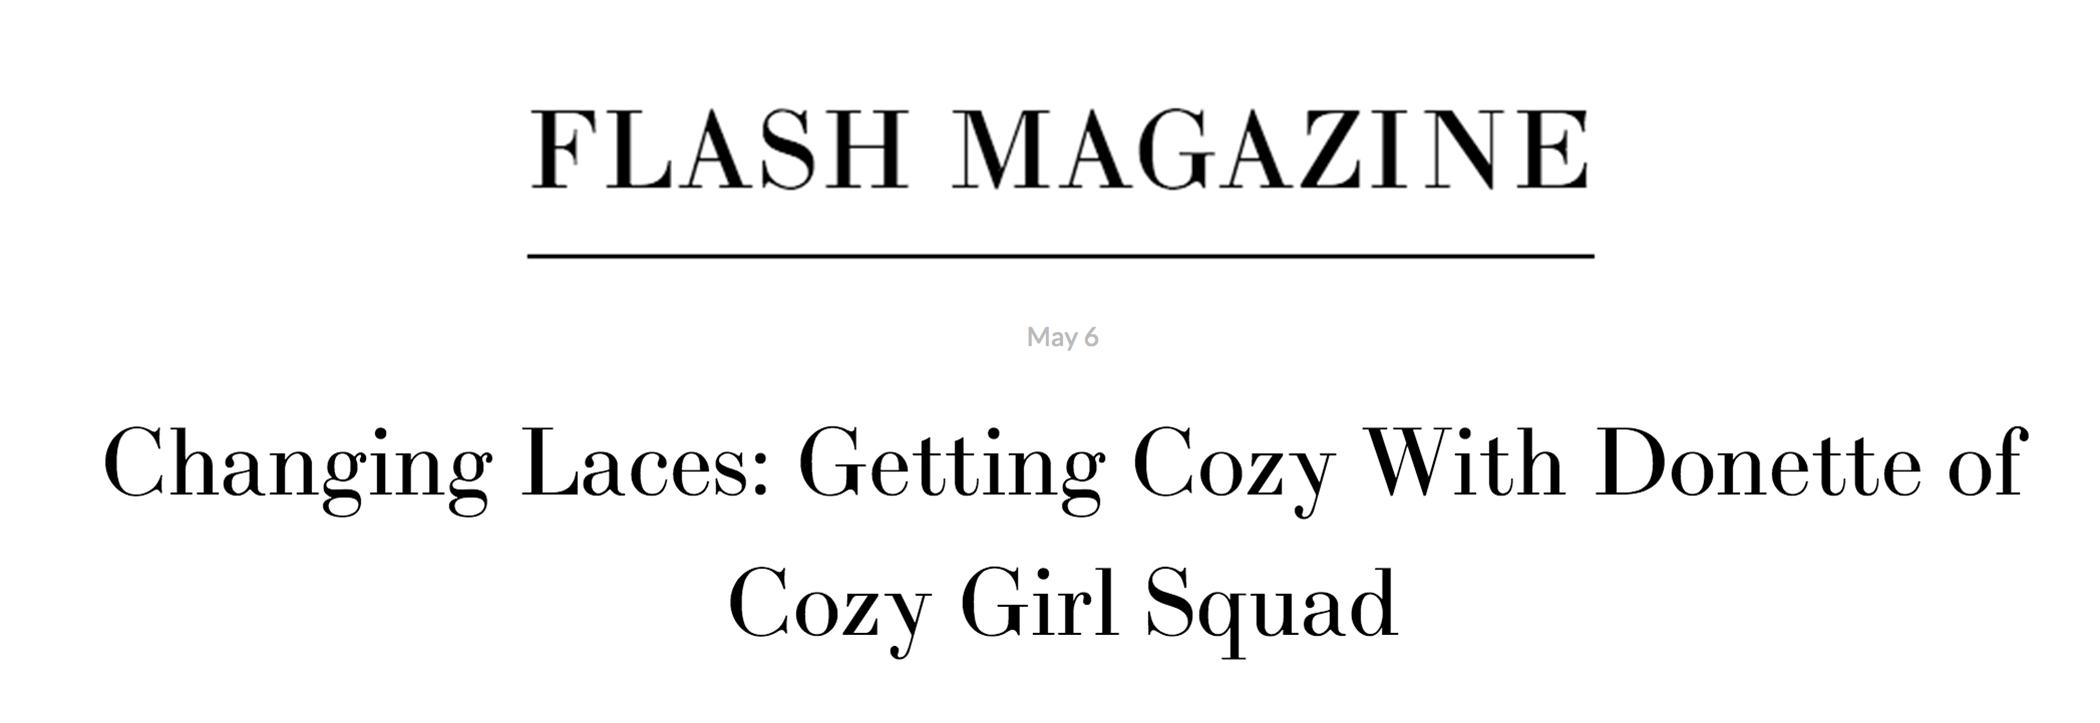 flashzine.png